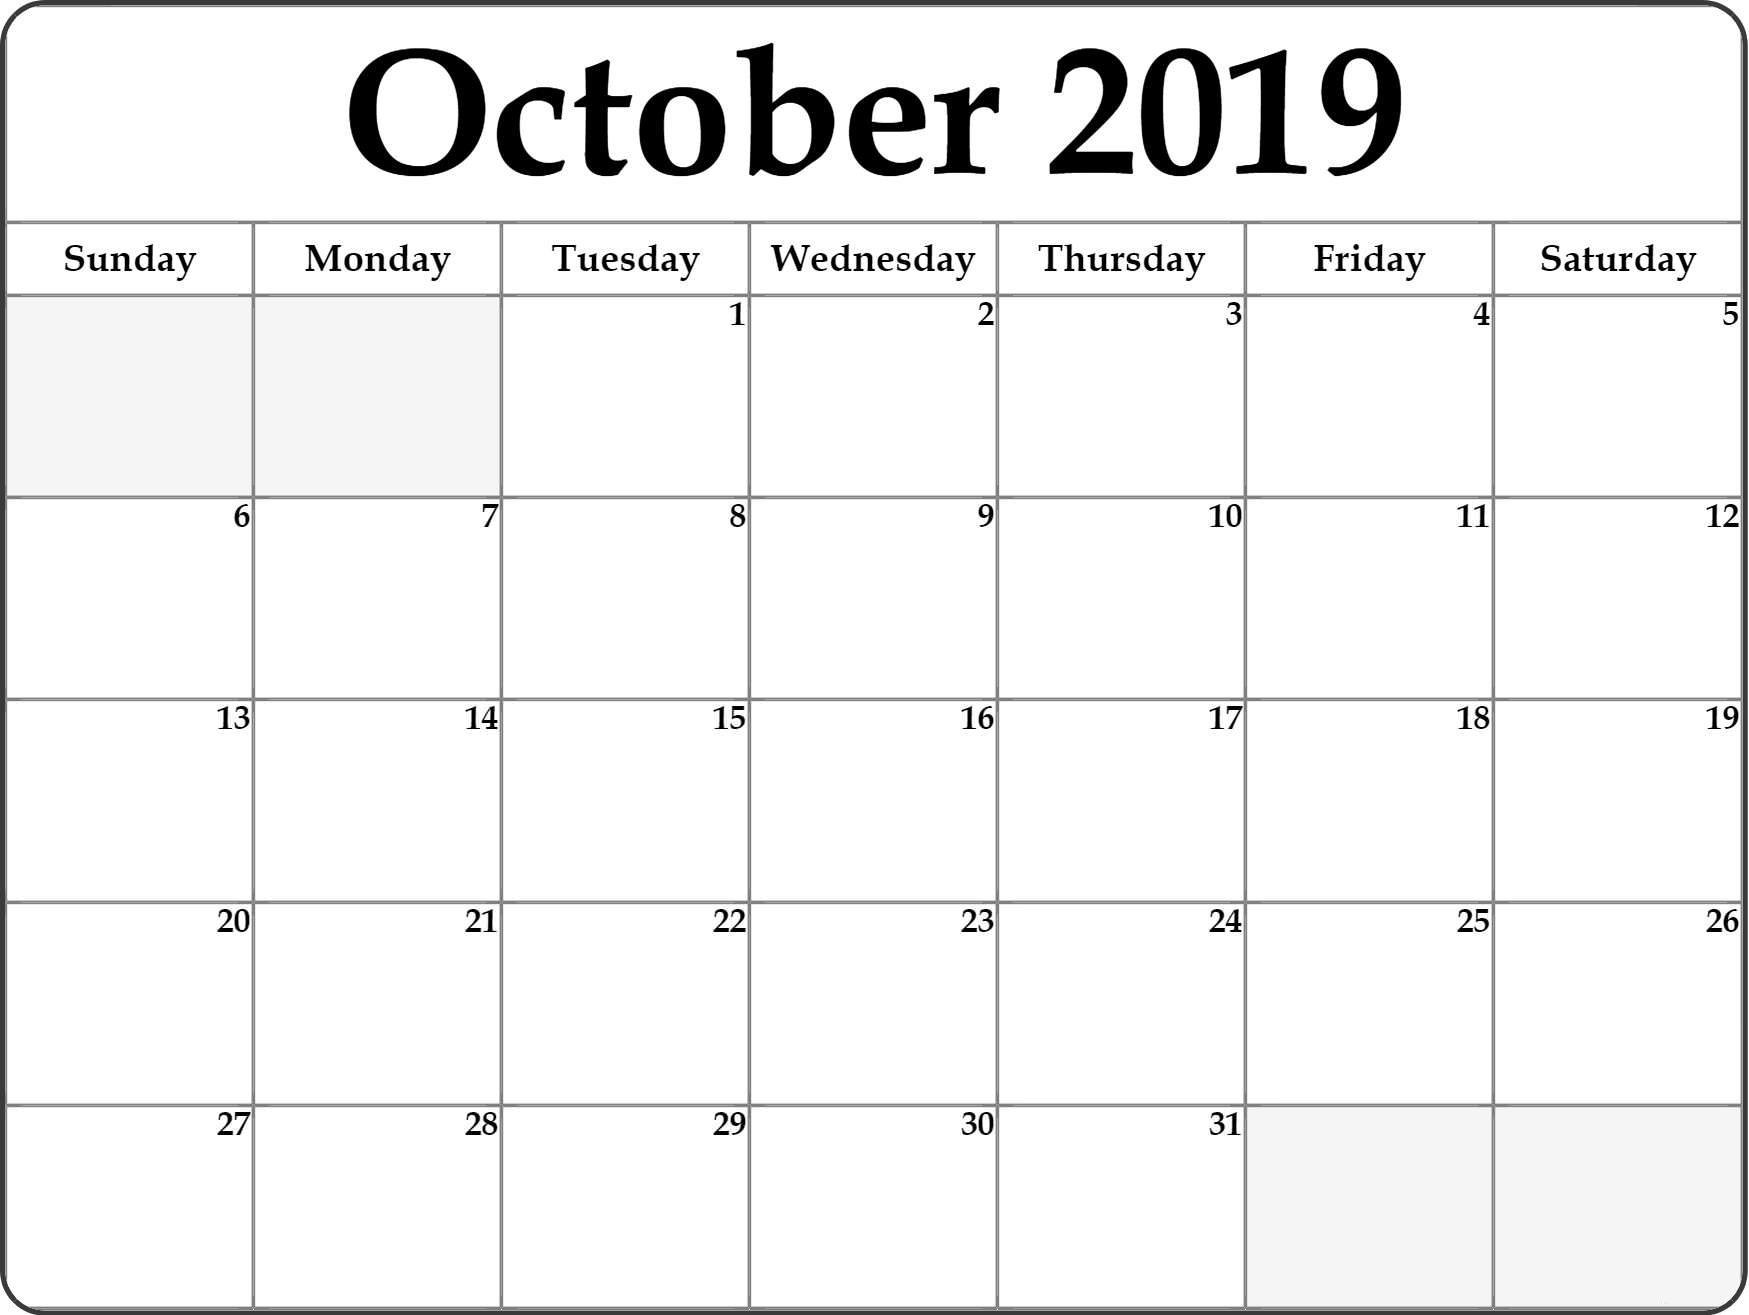 October 2019 Printable Calendar Blank